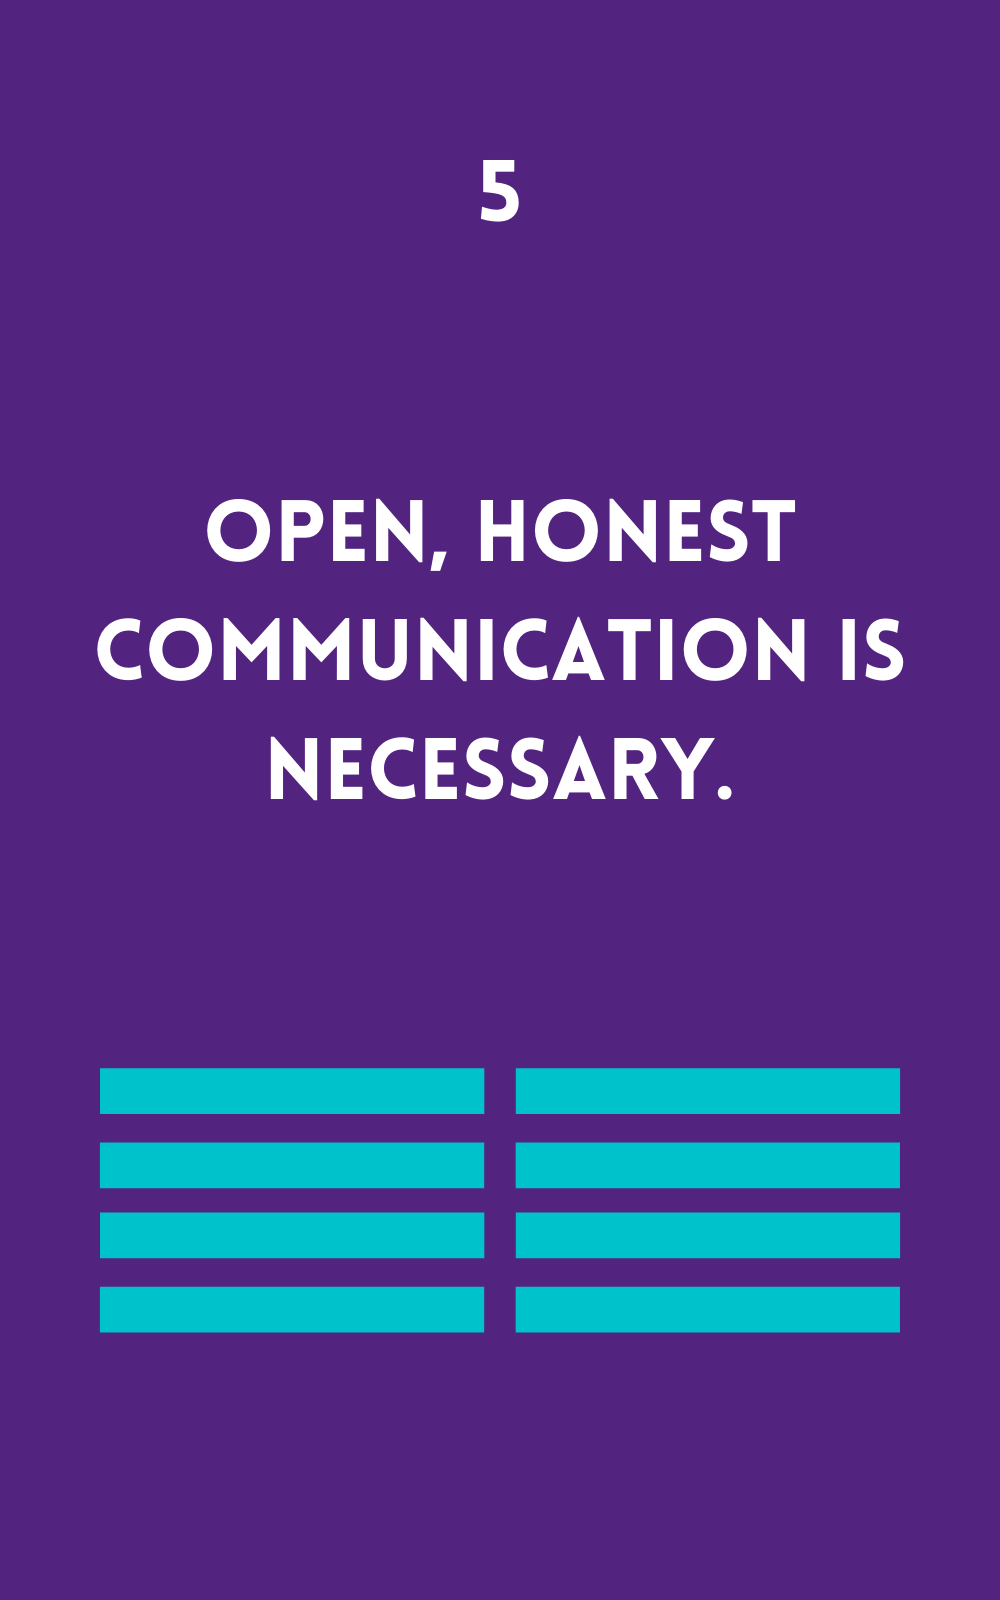 Open, honest communication is necessary.